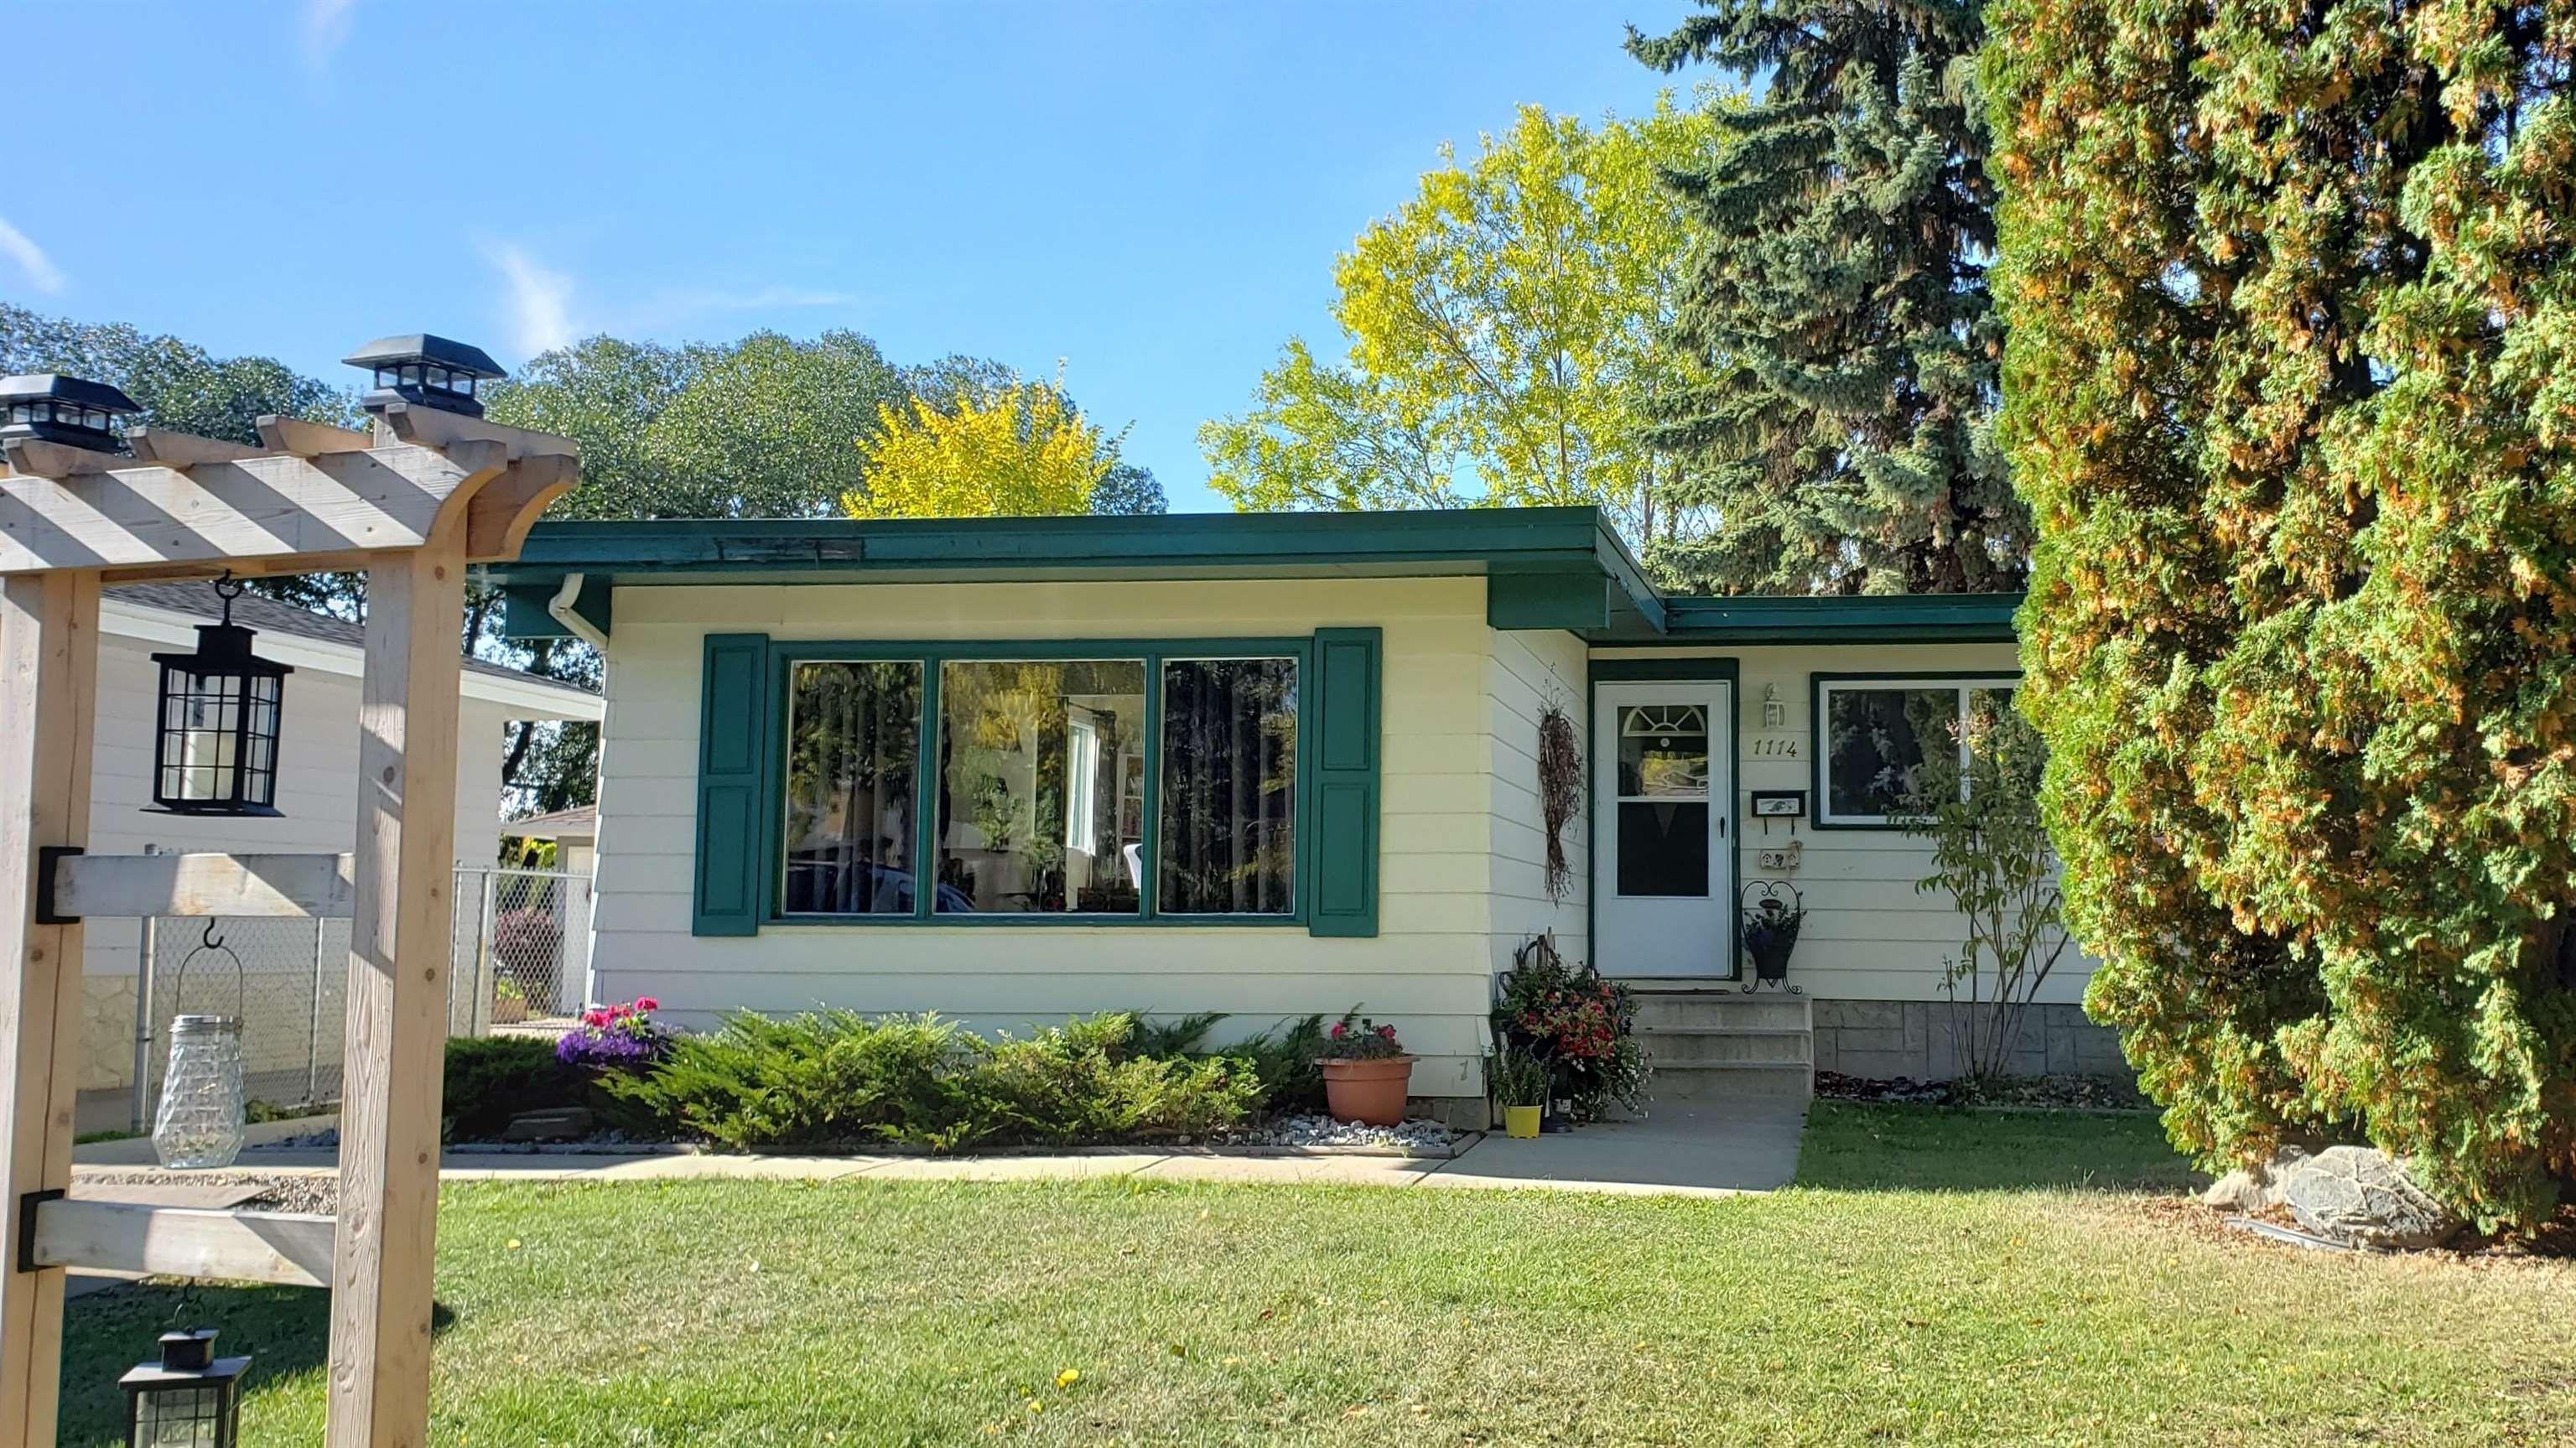 Main Photo: 1114 MOYER Drive: Sherwood Park House for sale : MLS®# E4254952